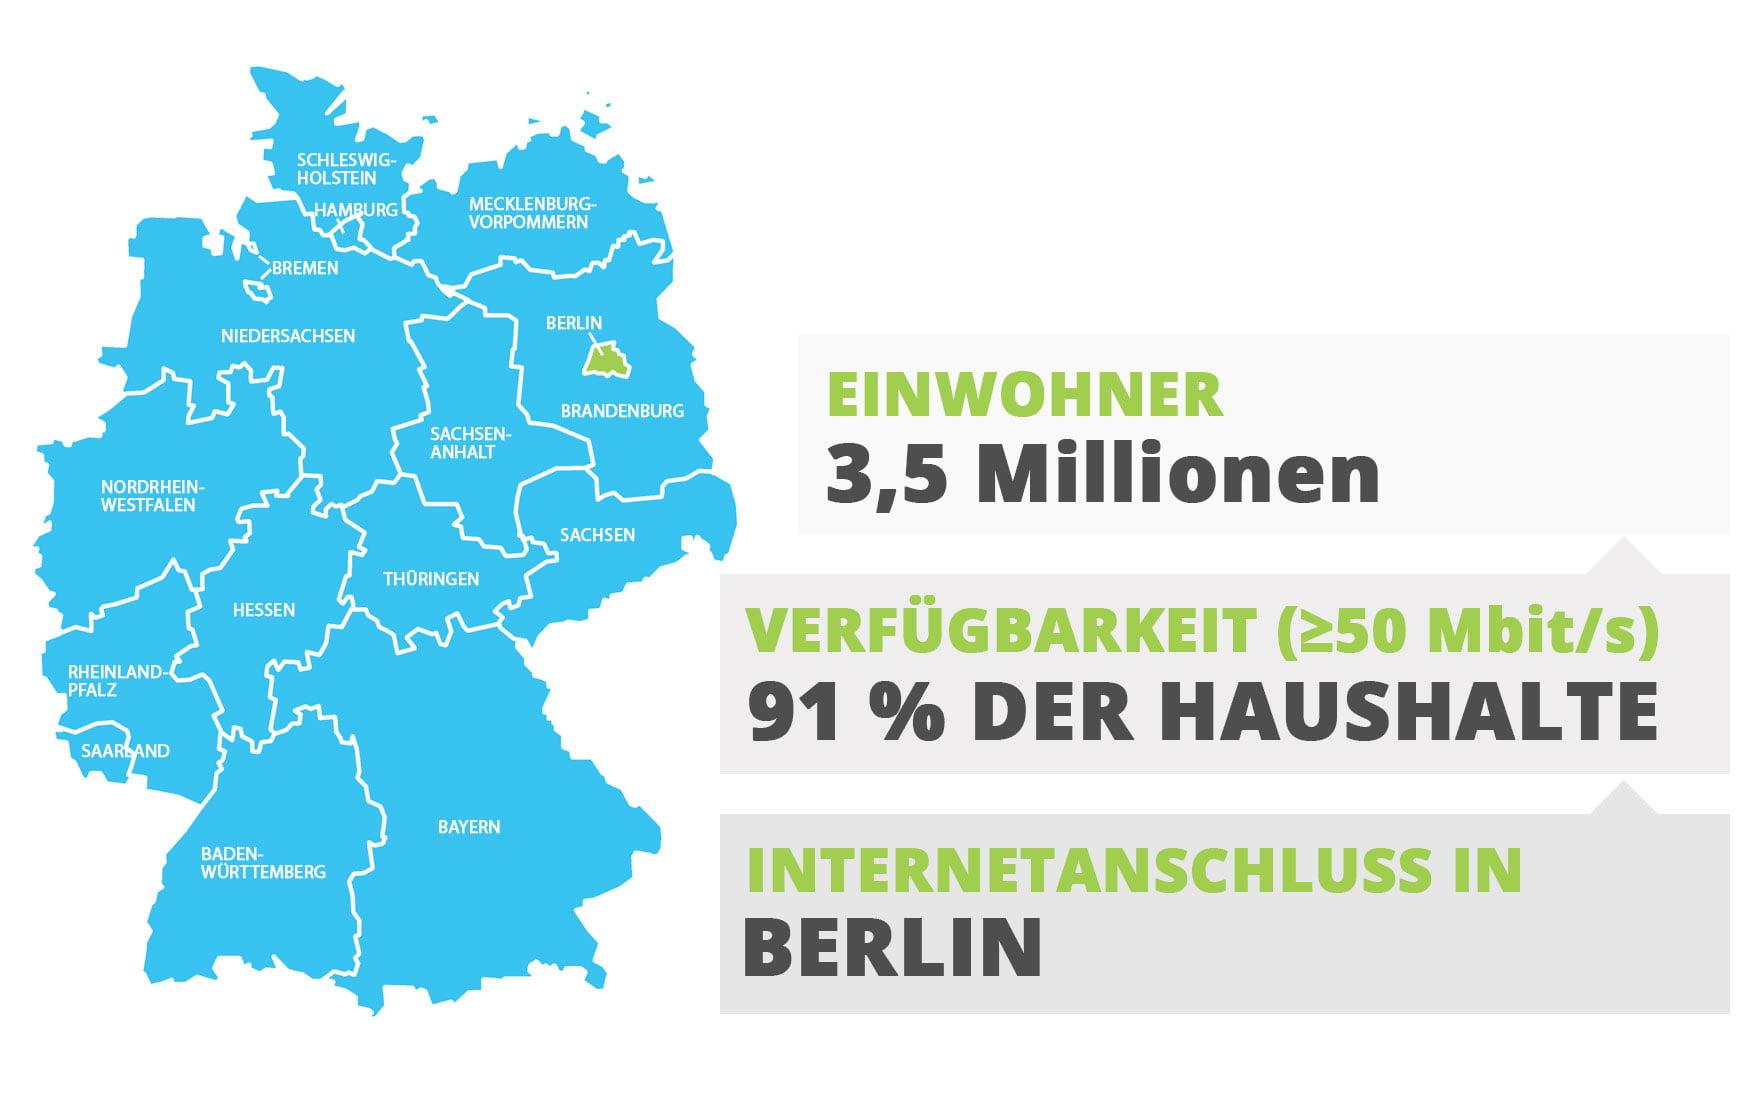 Internetanschluss in Berlin